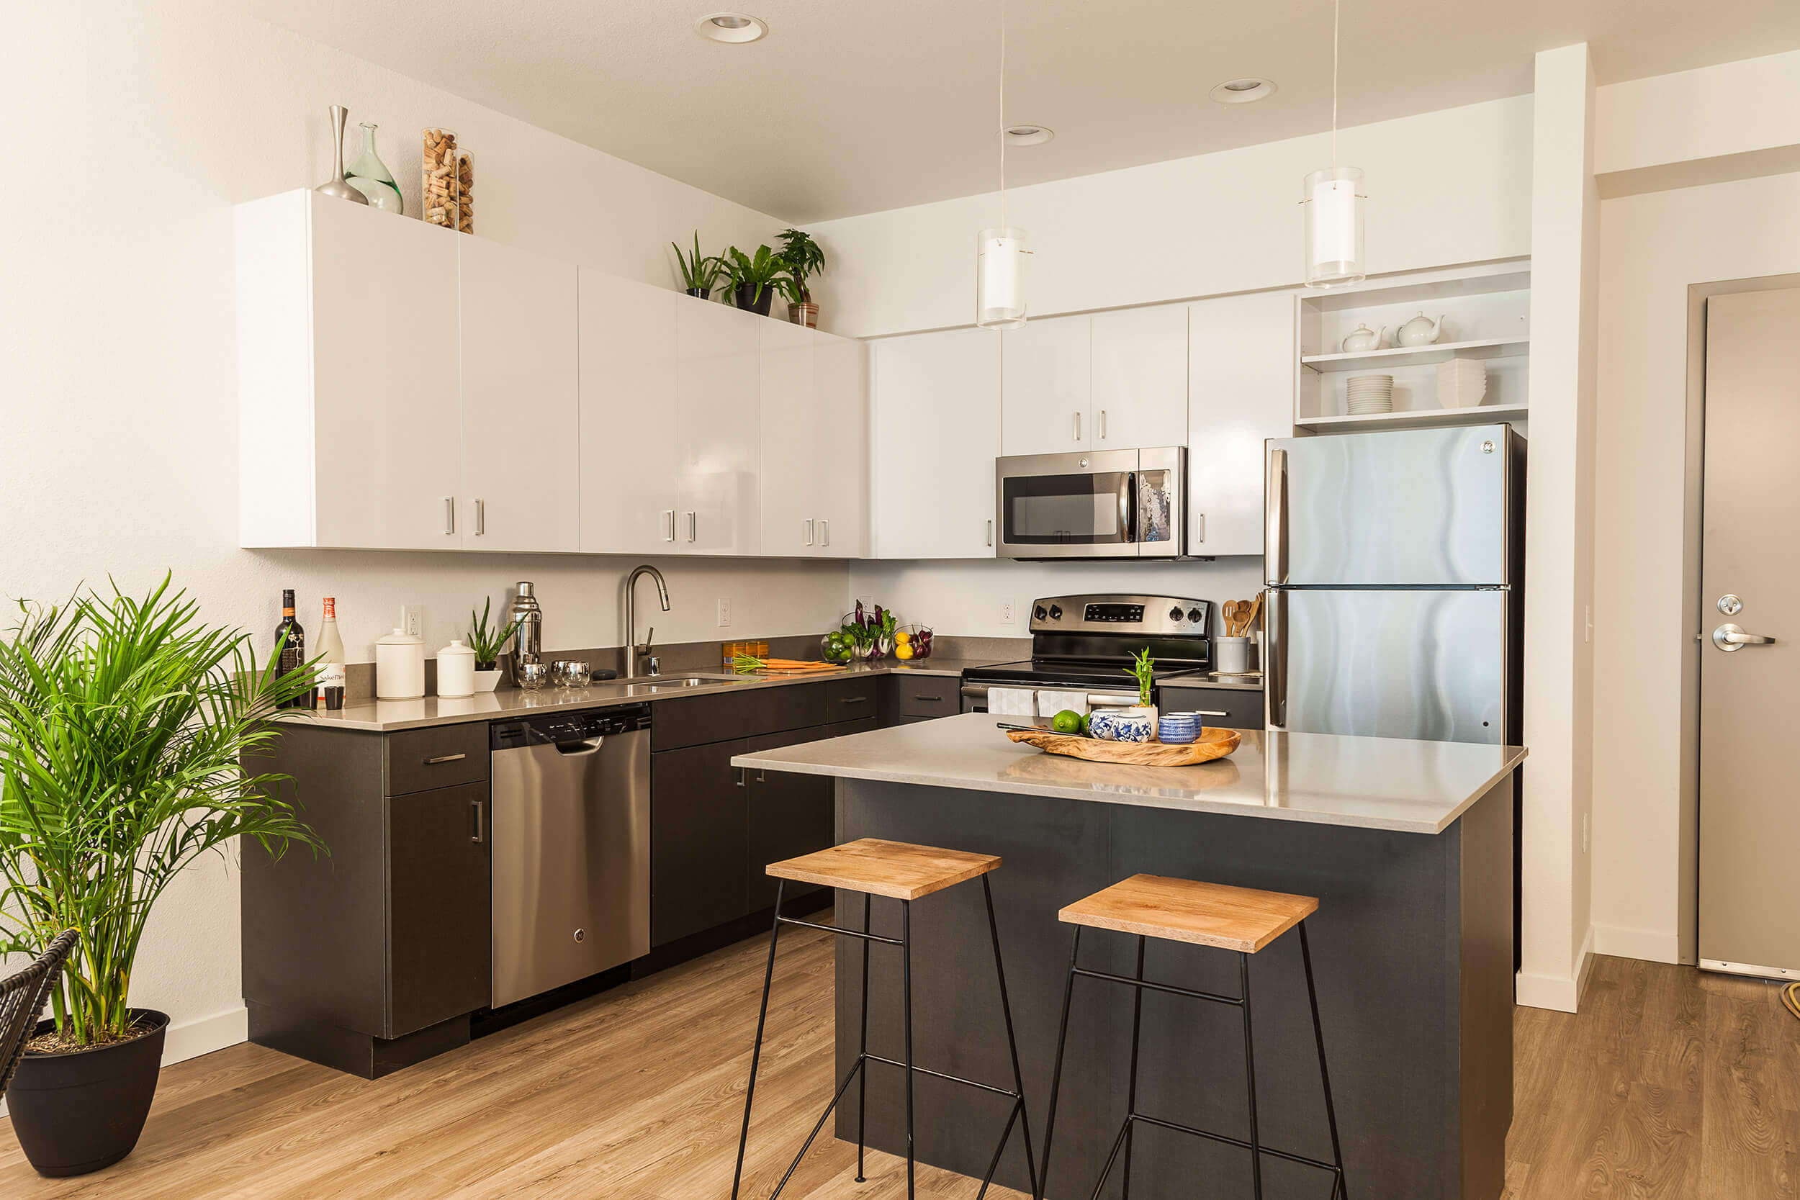 Kitchen Remodel with White & Dark Mix Cabinets - Aspire Utah Kitchen Remodeling Services